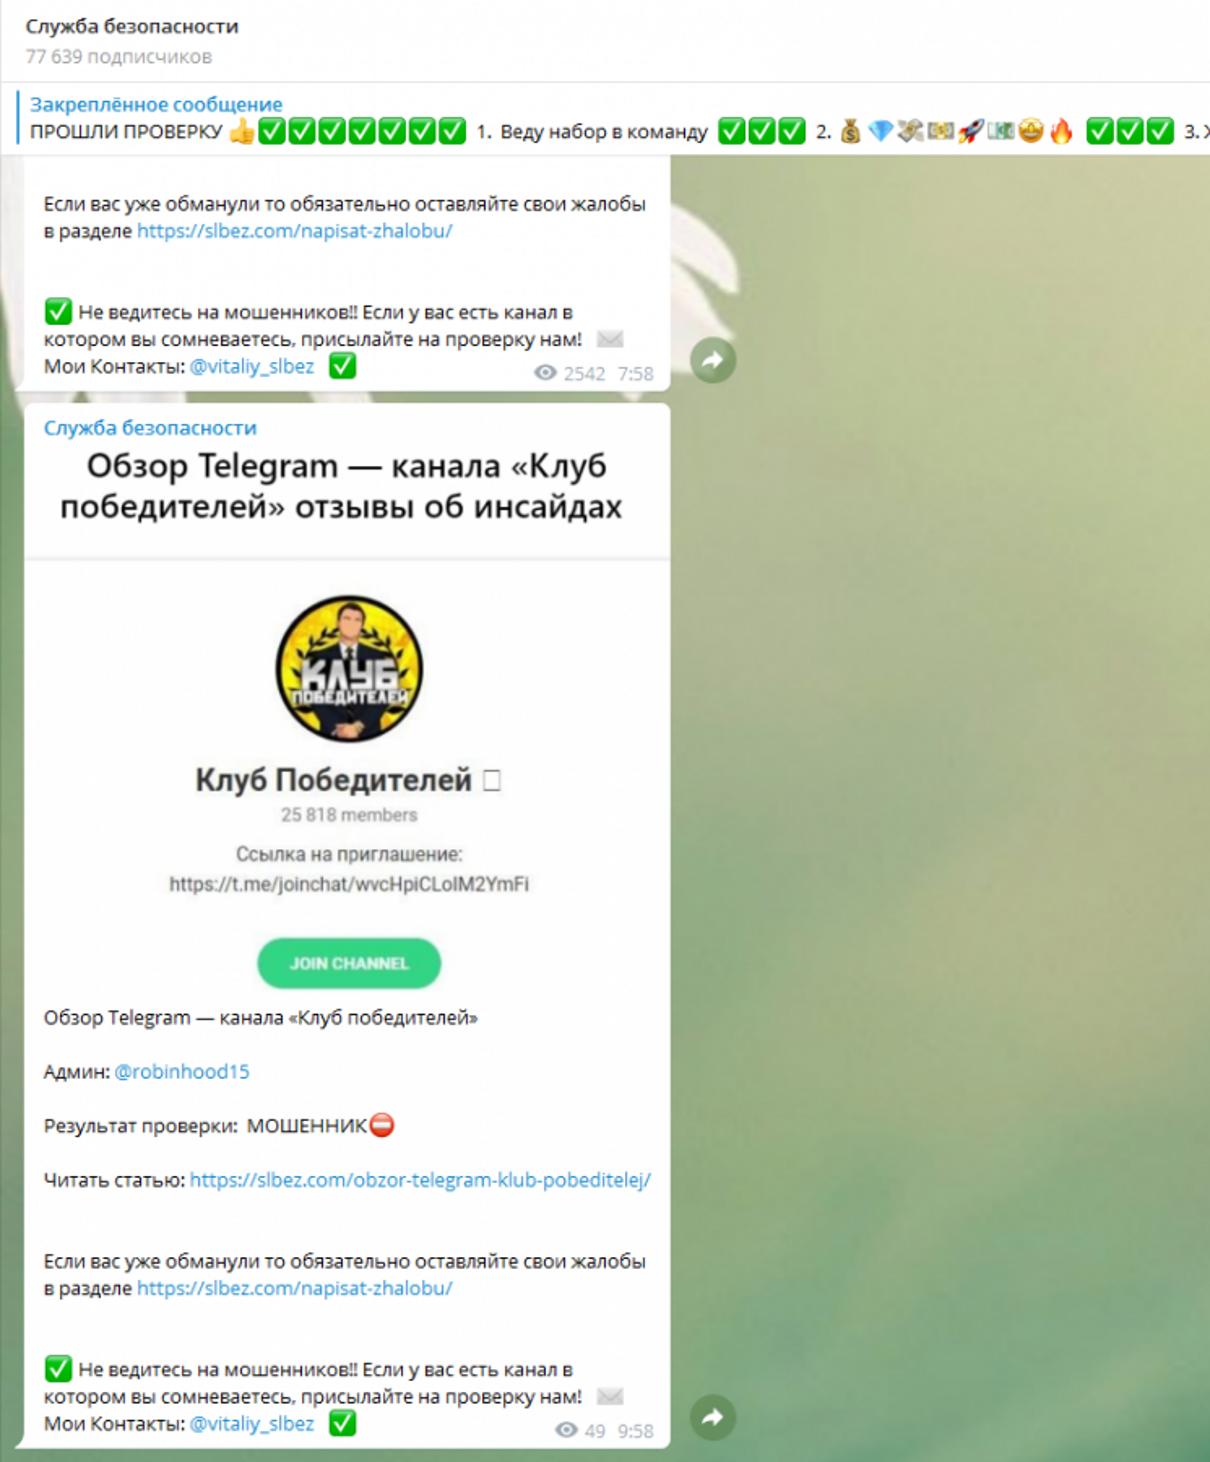 Жалоба-отзыв: Slbez.com - Отзыв-жалоба на рейтинг мошенника Slbez.com, @vitaliy_slbez.  Фото №1